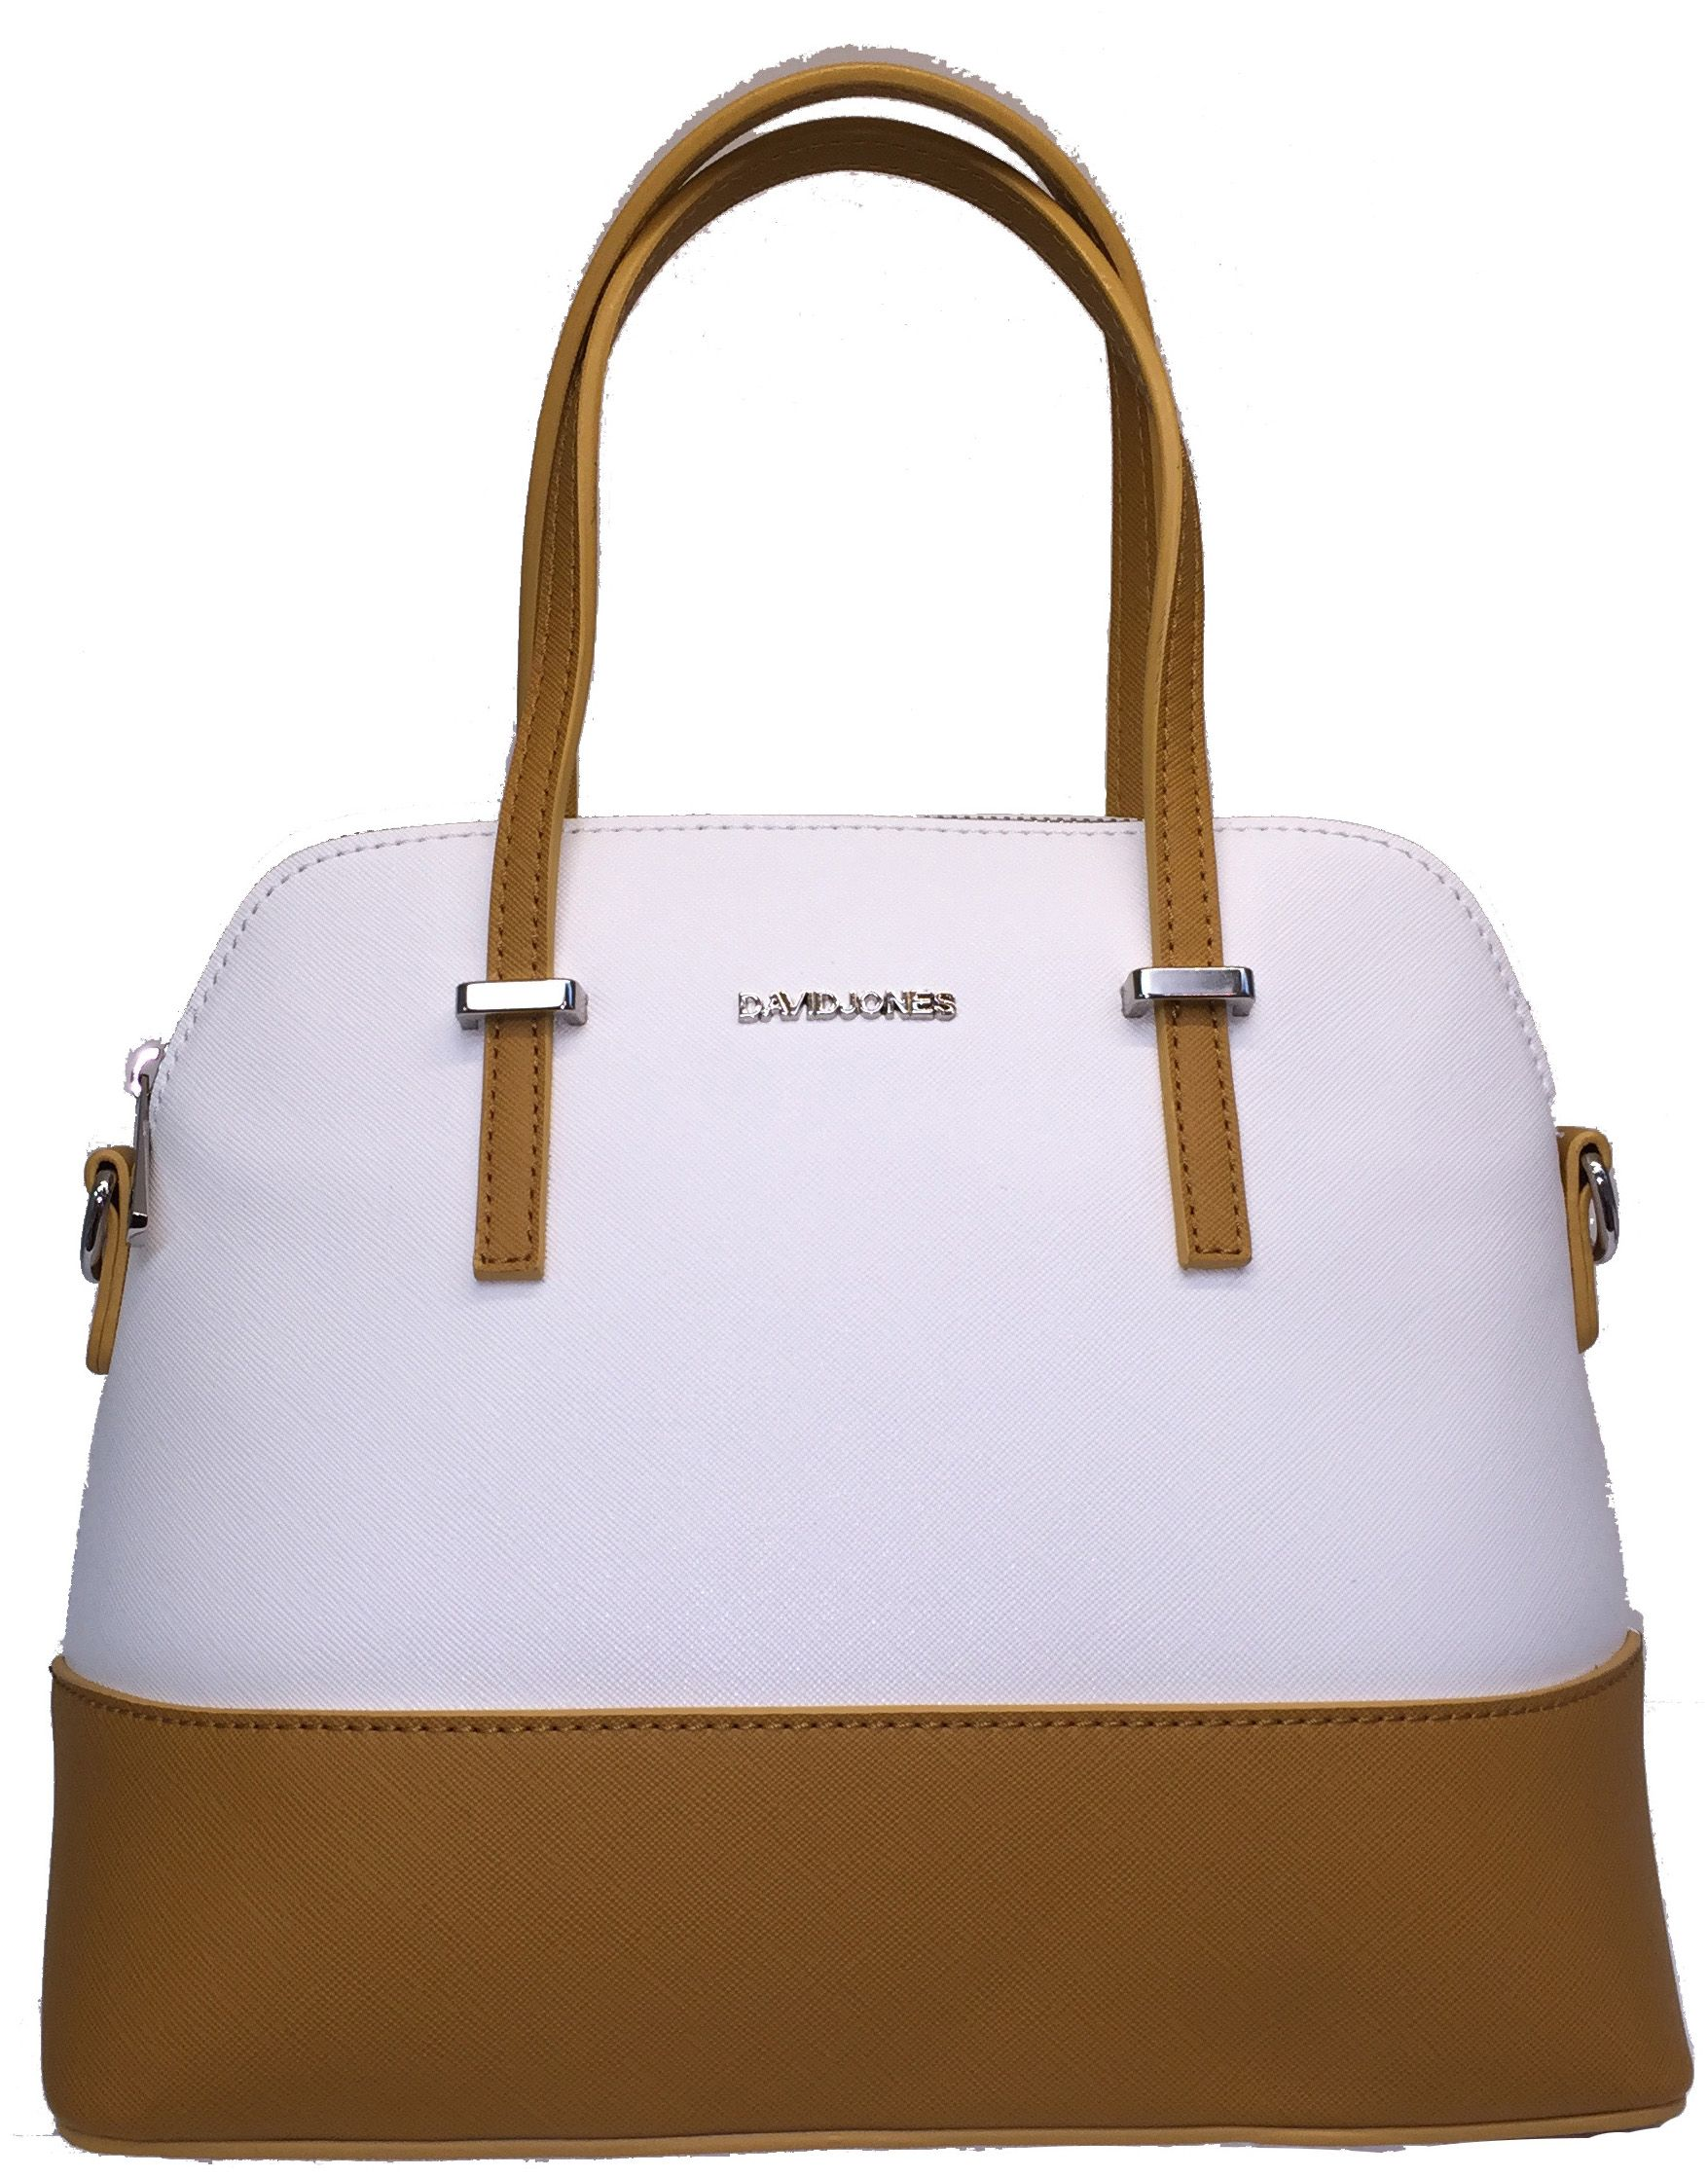 cfd32d858e7e David Jones Yellow & White Bag   .○•°○Dream bag○°•○.